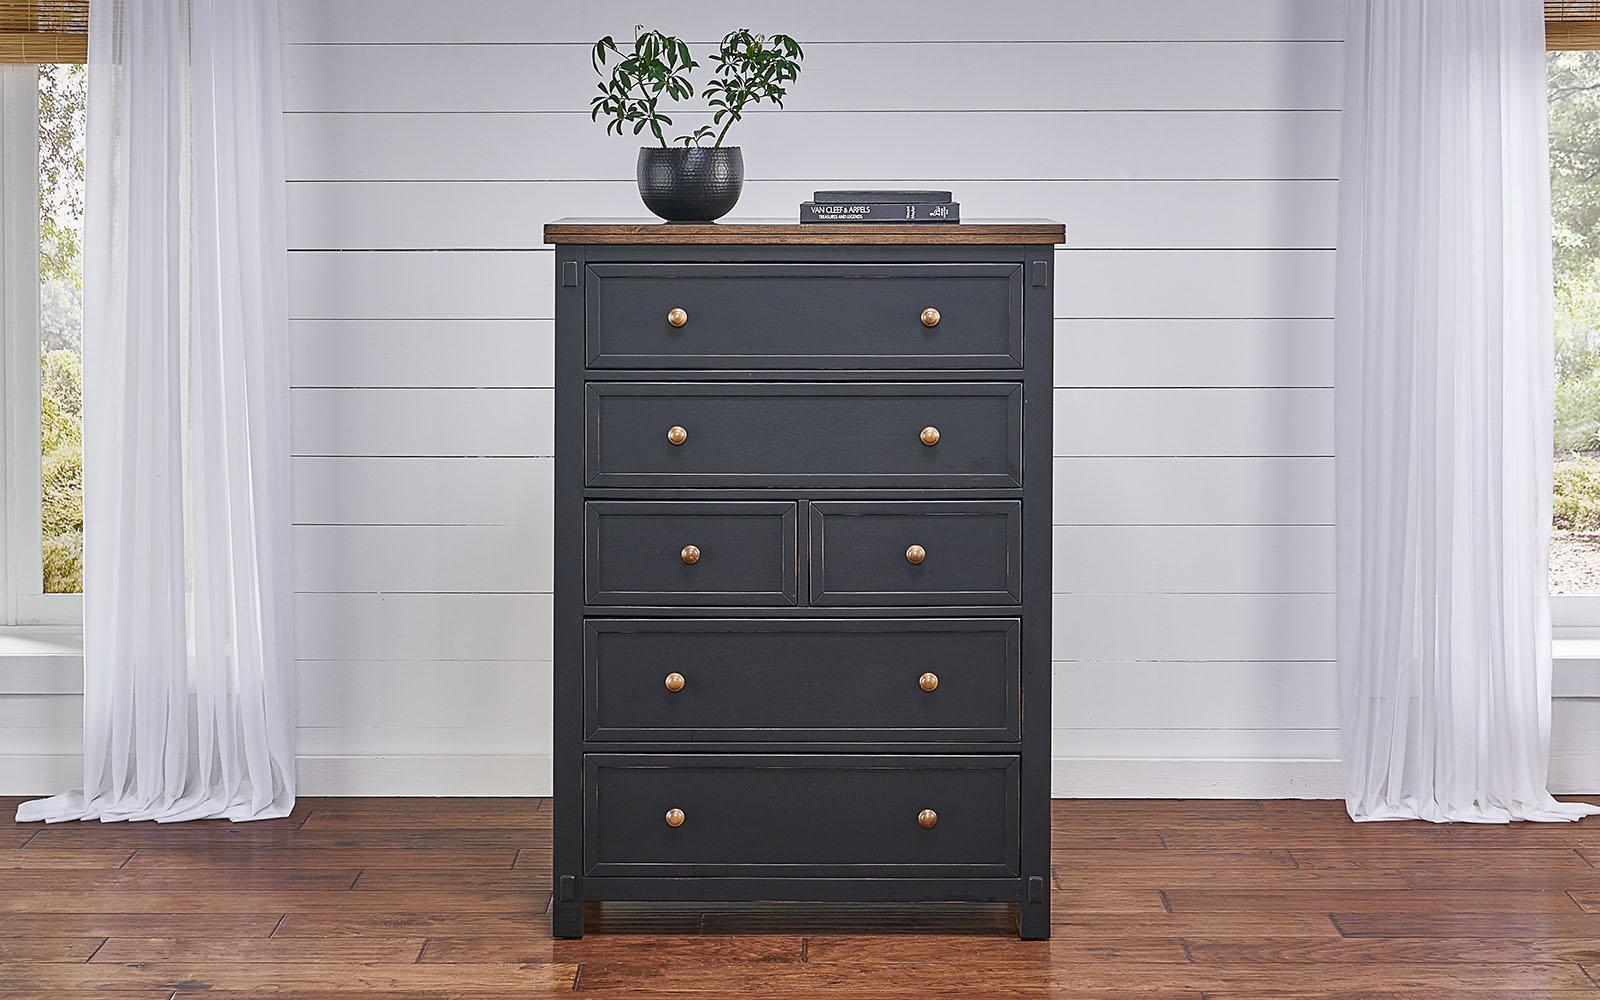 A AmericaStormy Ridge 6 Drawer Dresser